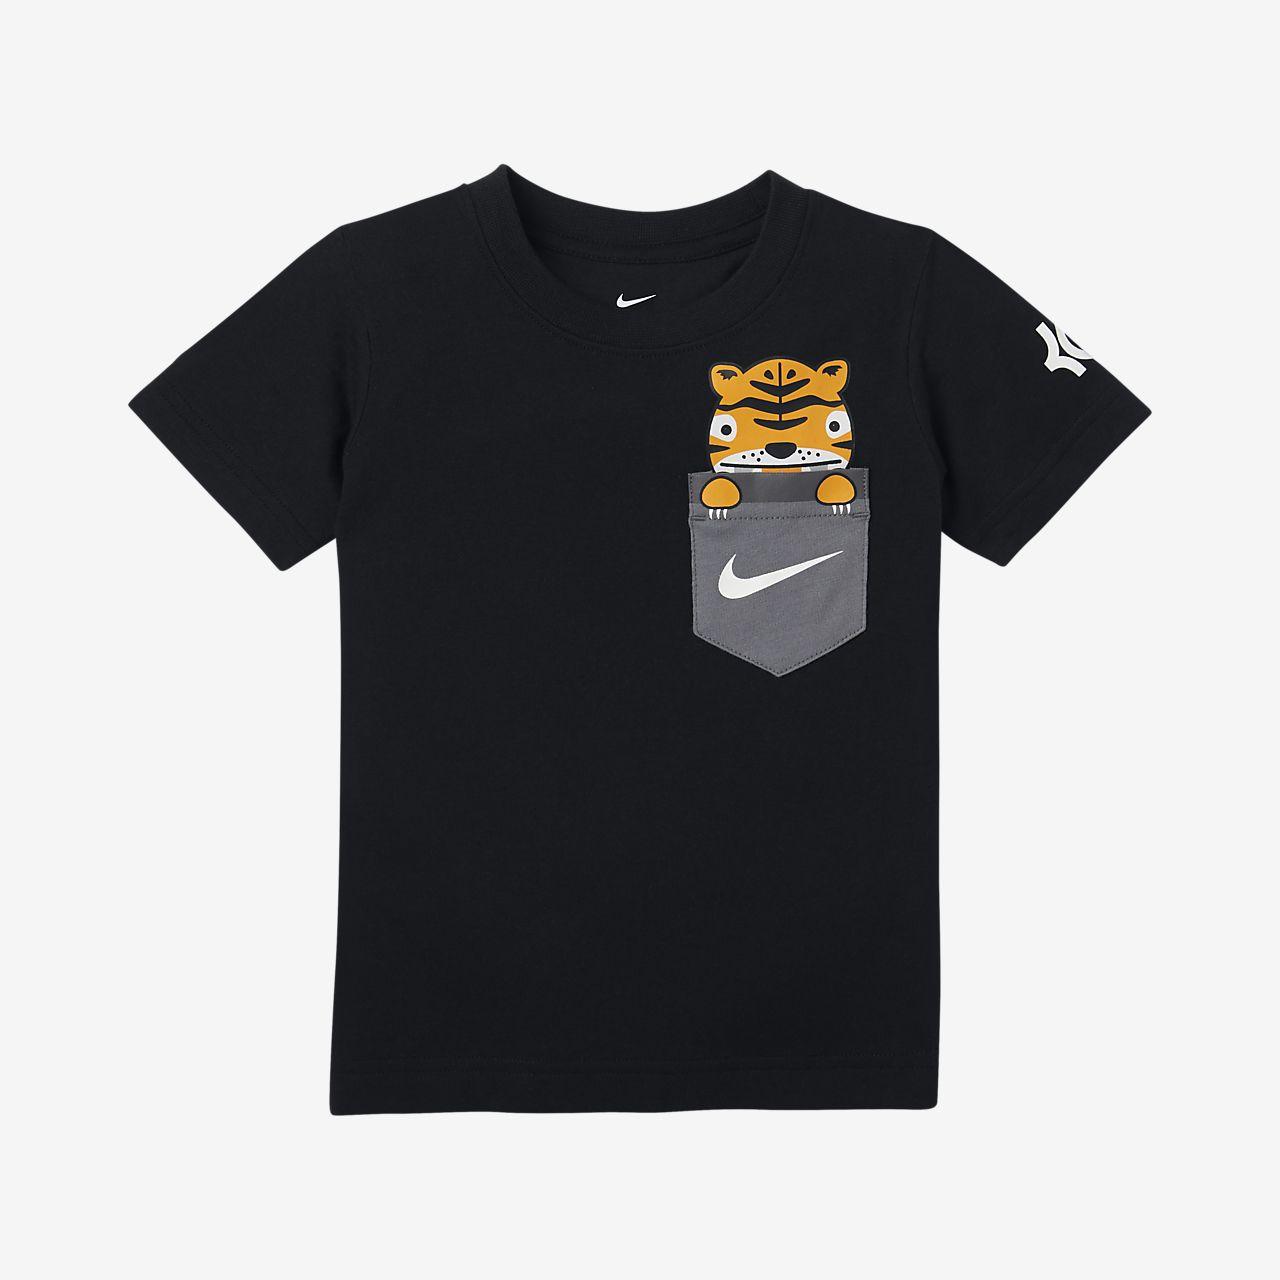 ddc4eb23c5ec KD Little Big Cats Toddler T-Shirt. Nike.com